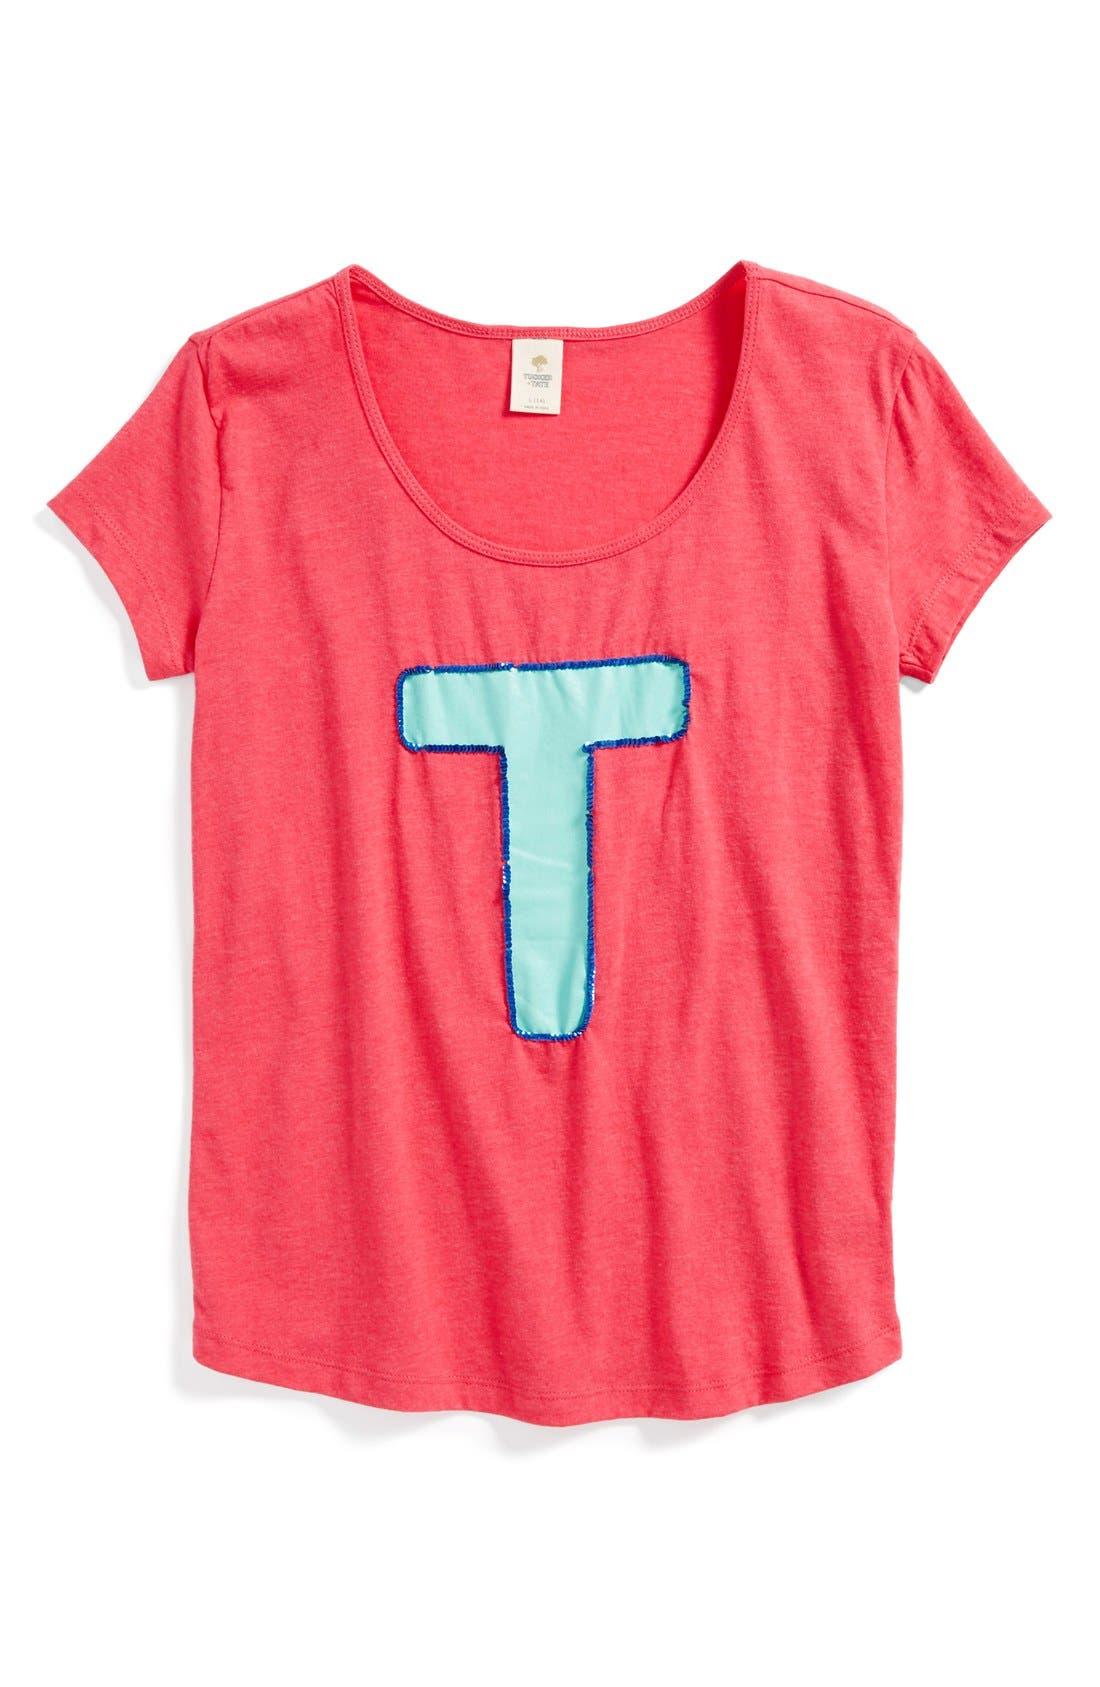 Main Image - Tucker + Tate 'Dockside' Graphic Tee (Big Girls)